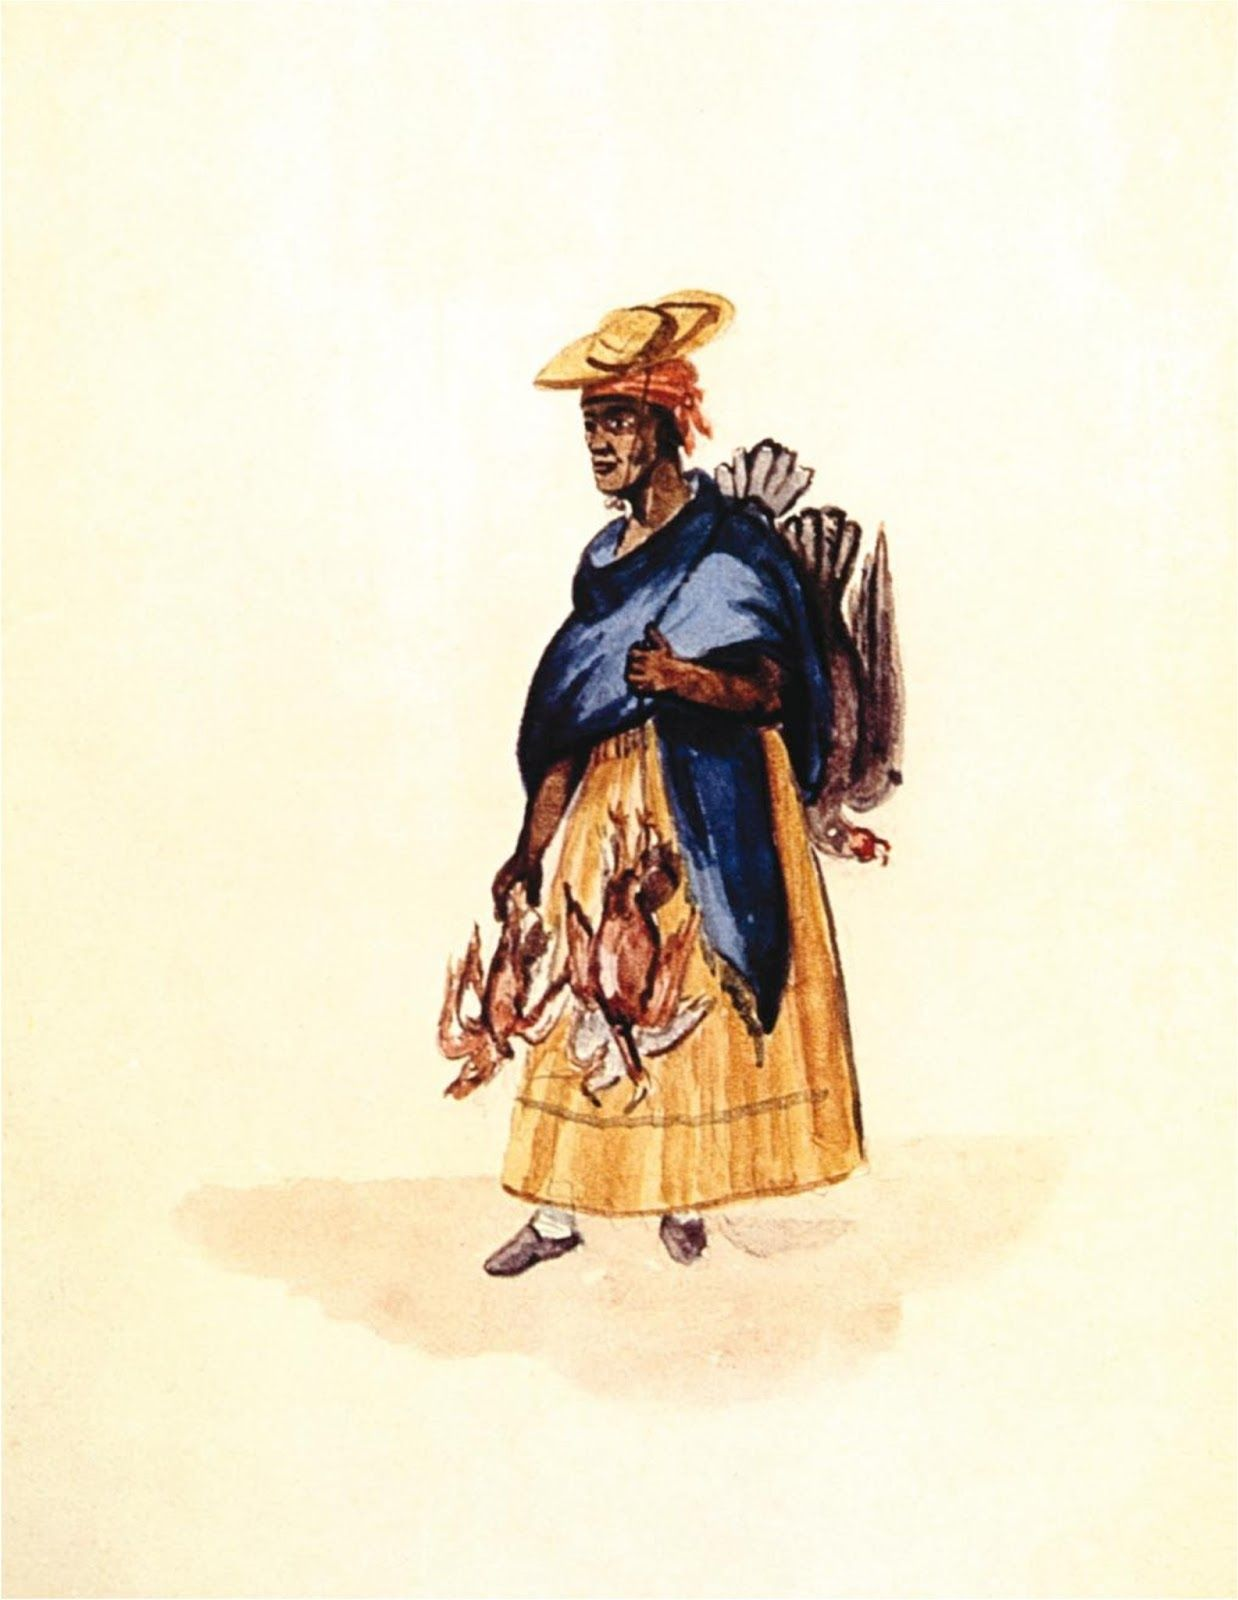 francisco fierro   Pancho Fierro, Vendedora de aves, en Manuel Cisneros  Sánchez, Pancho   Art, Pancho, San martin de porres